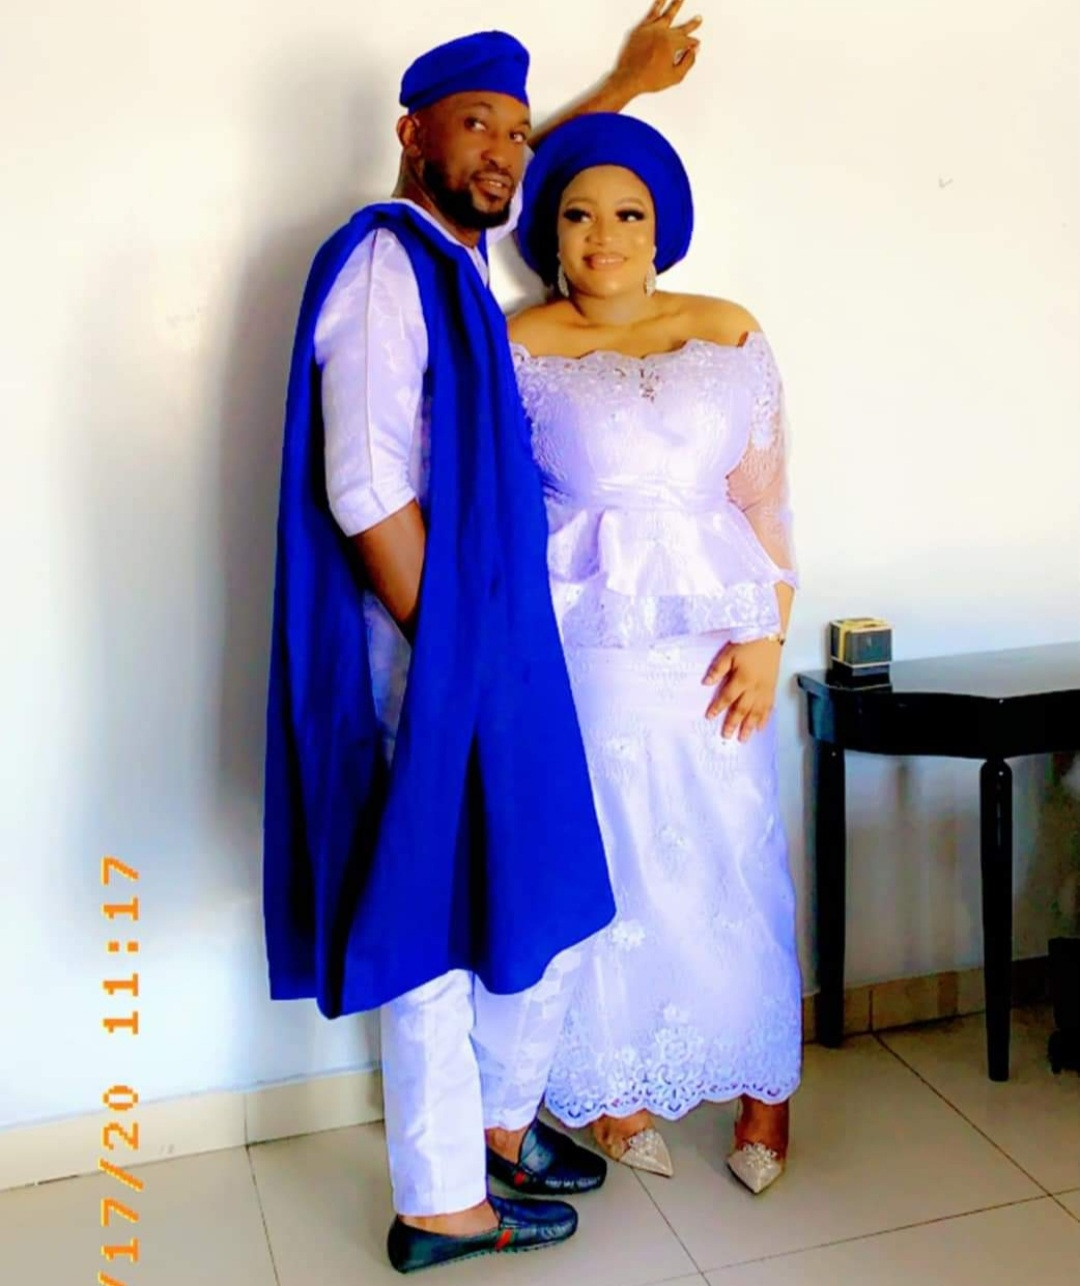 Chukwutem Victor Inalu and his wife, Onyinye Onome